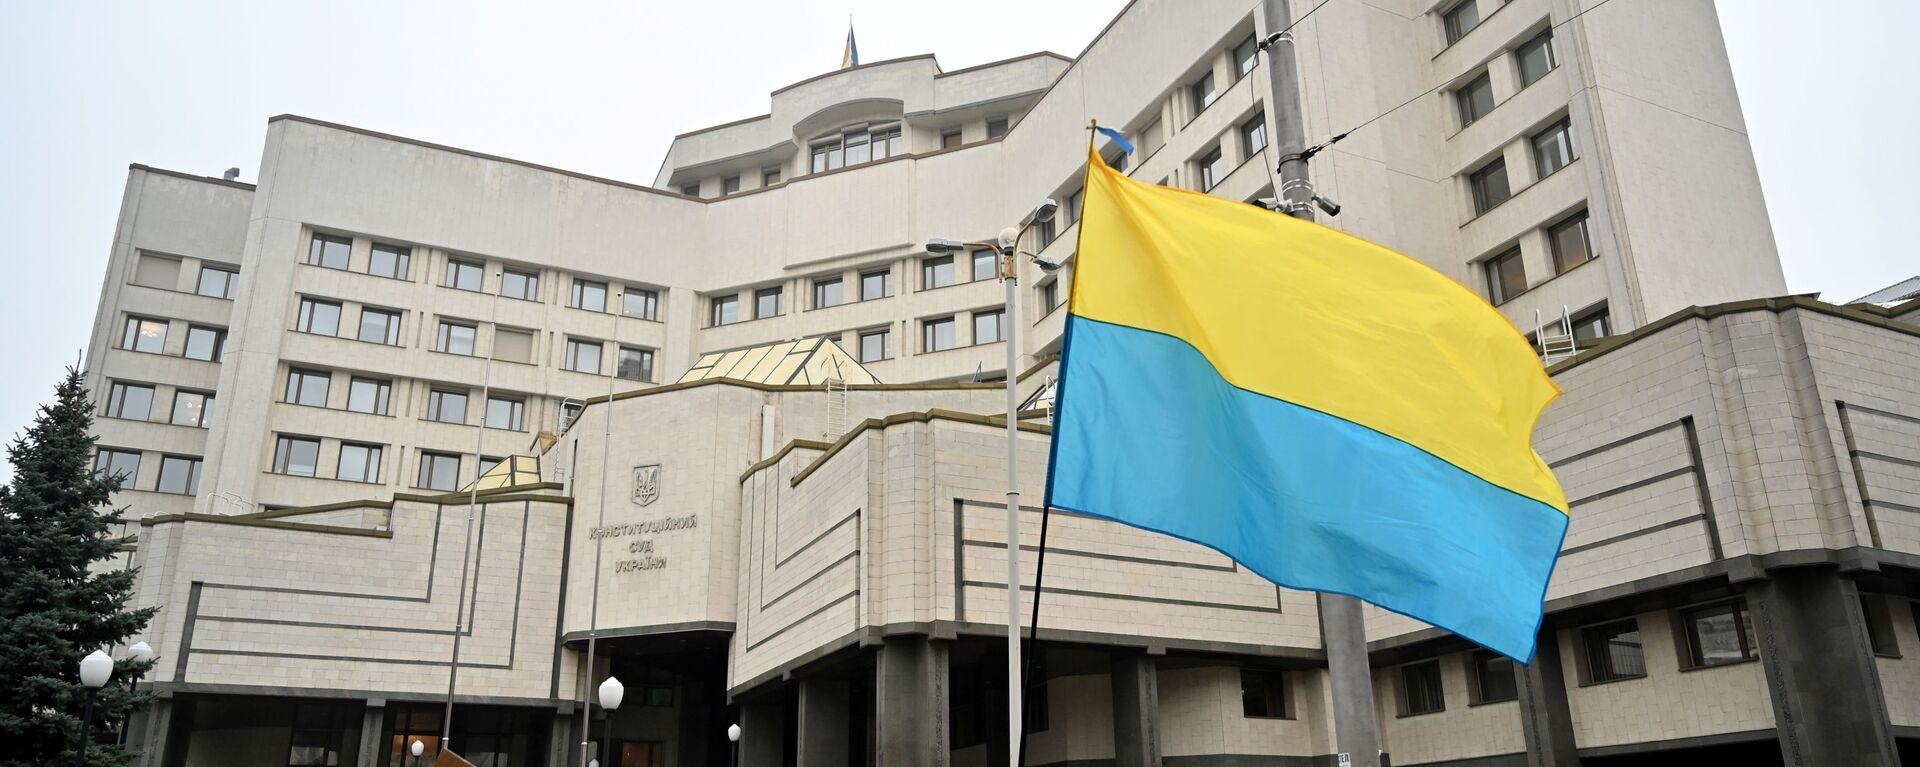 Киев, Украина - Sputnik Тоҷикистон, 1920, 24.08.2021